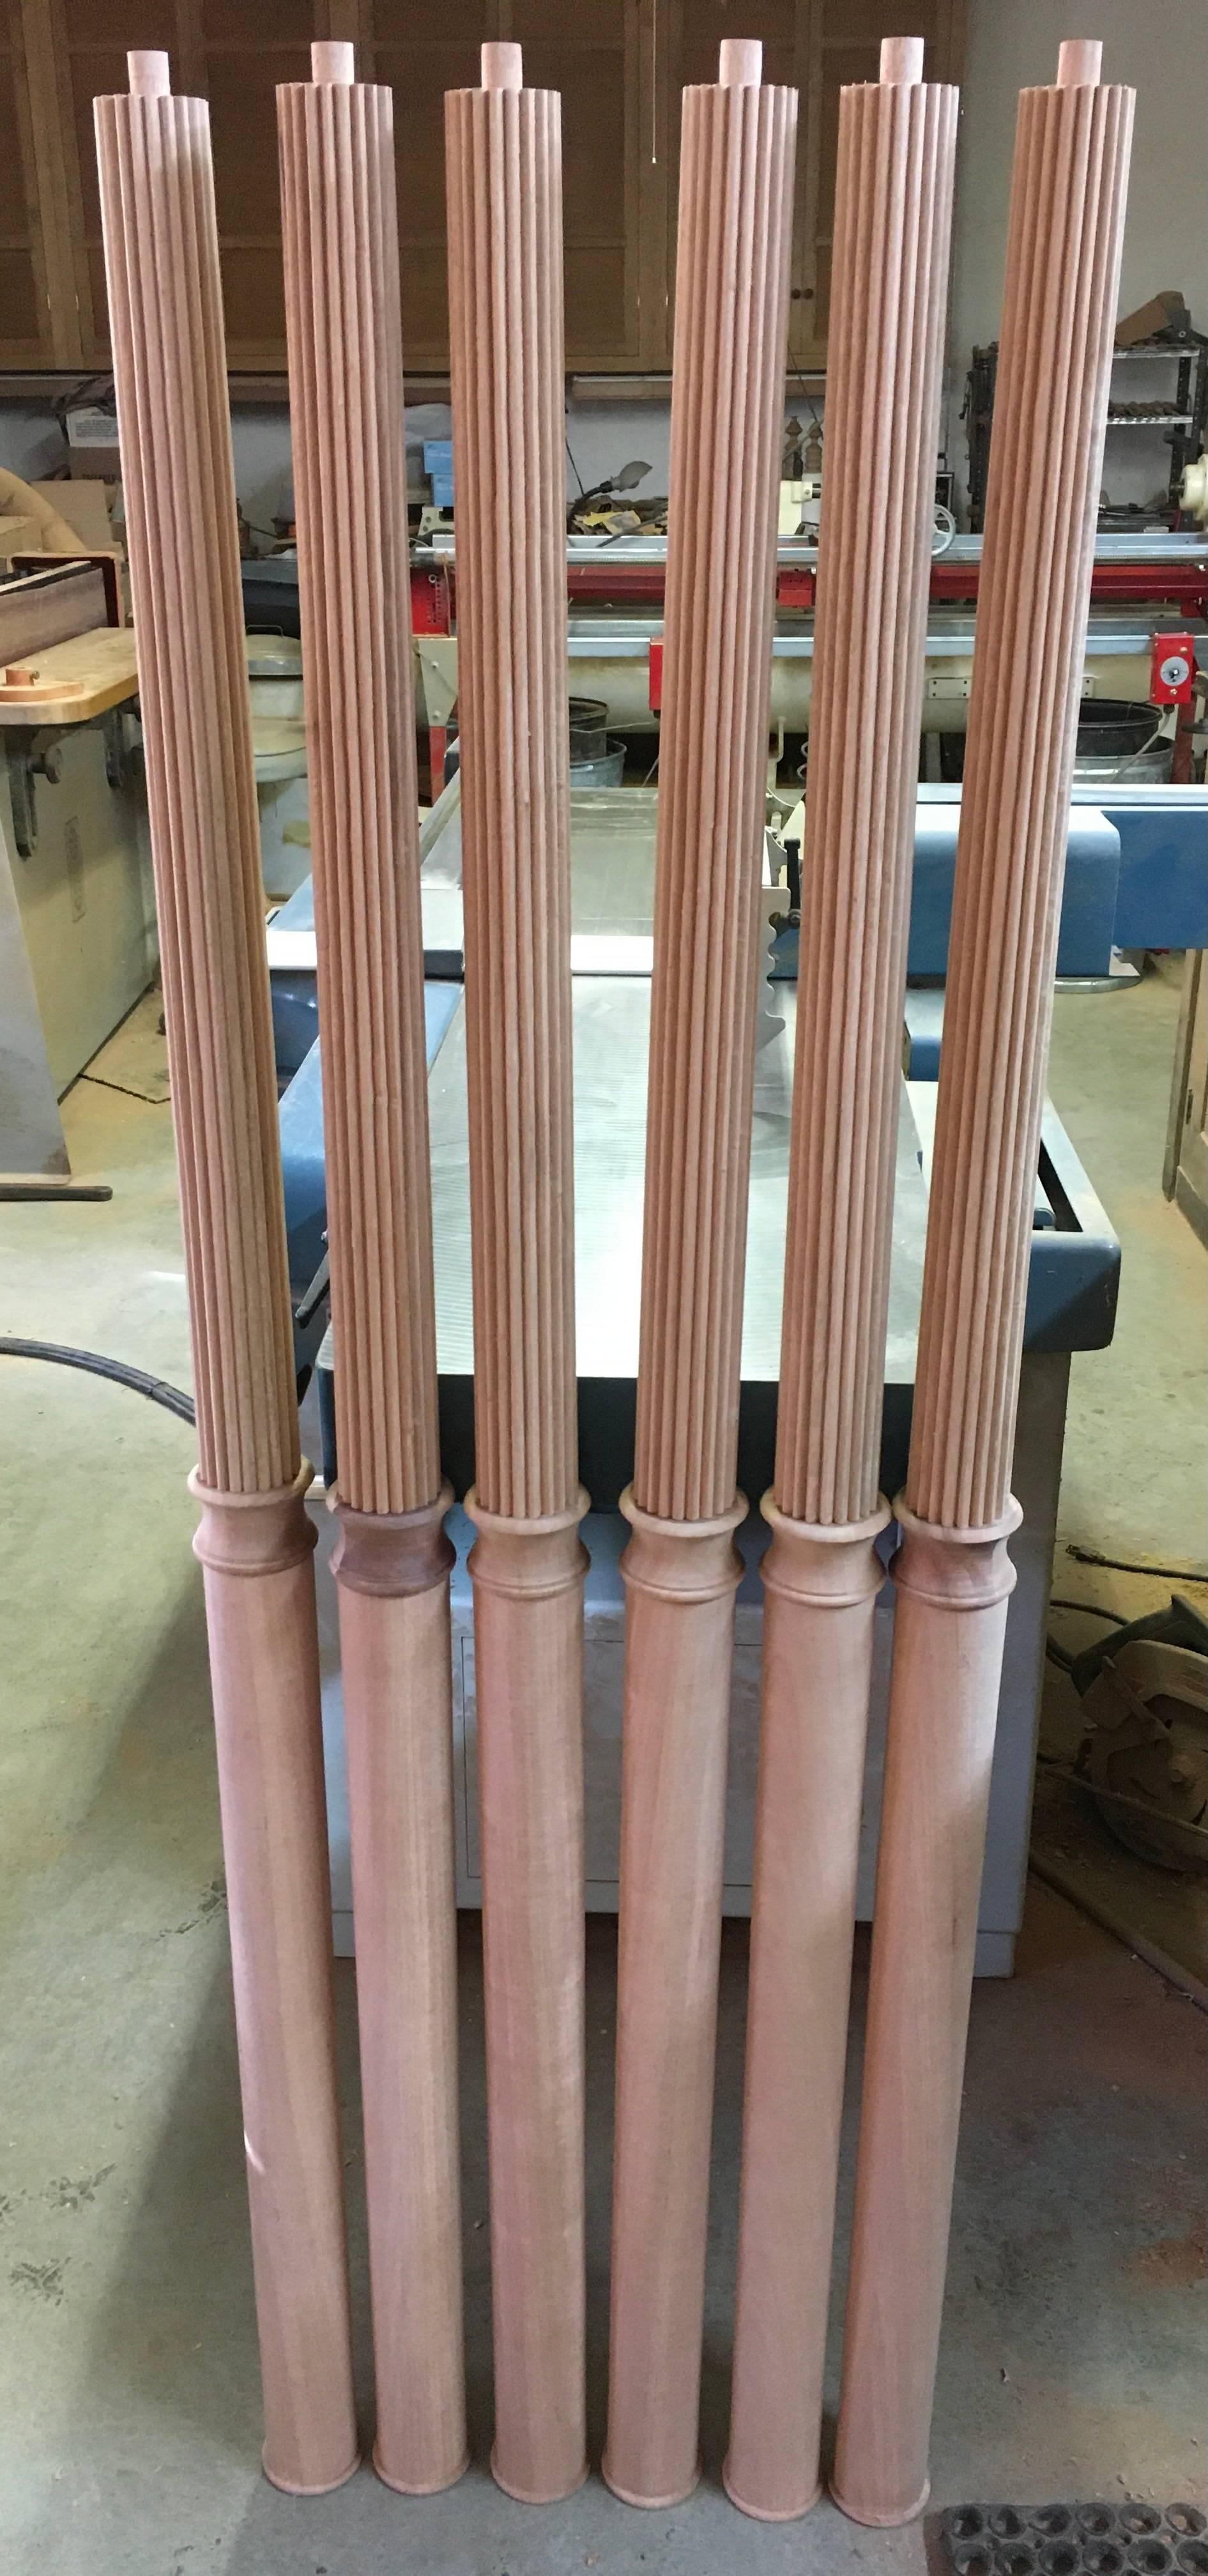 Reeded columns